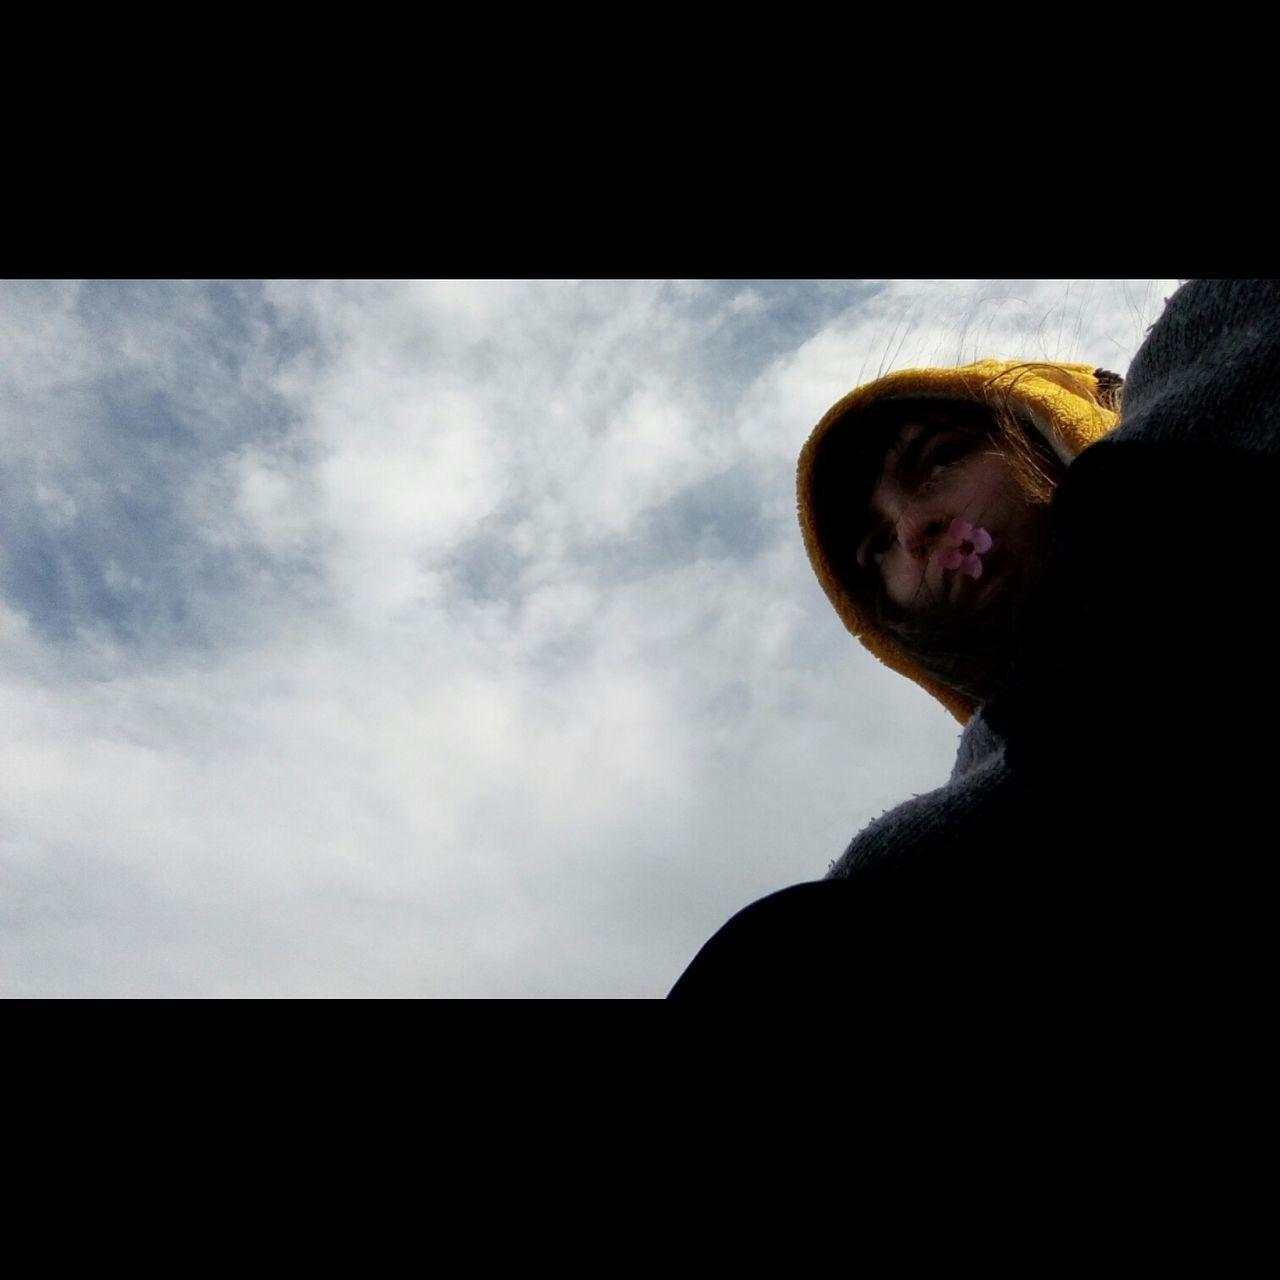 One Person Real People Cloud - Sky Sky Day Outdoors Mylove Mi Amor Amor Love Couple Relationship Inlove Hermosa Beatiful Flower Flor Pikachu Long Goodbye EyeEmNewHere Resist EyeEm Diversity The Secret Spaces Neighborhood Map Visual Feast The Portraitist - 2017 EyeEm Awards The Street Photographer - 2017 EyeEm Awards